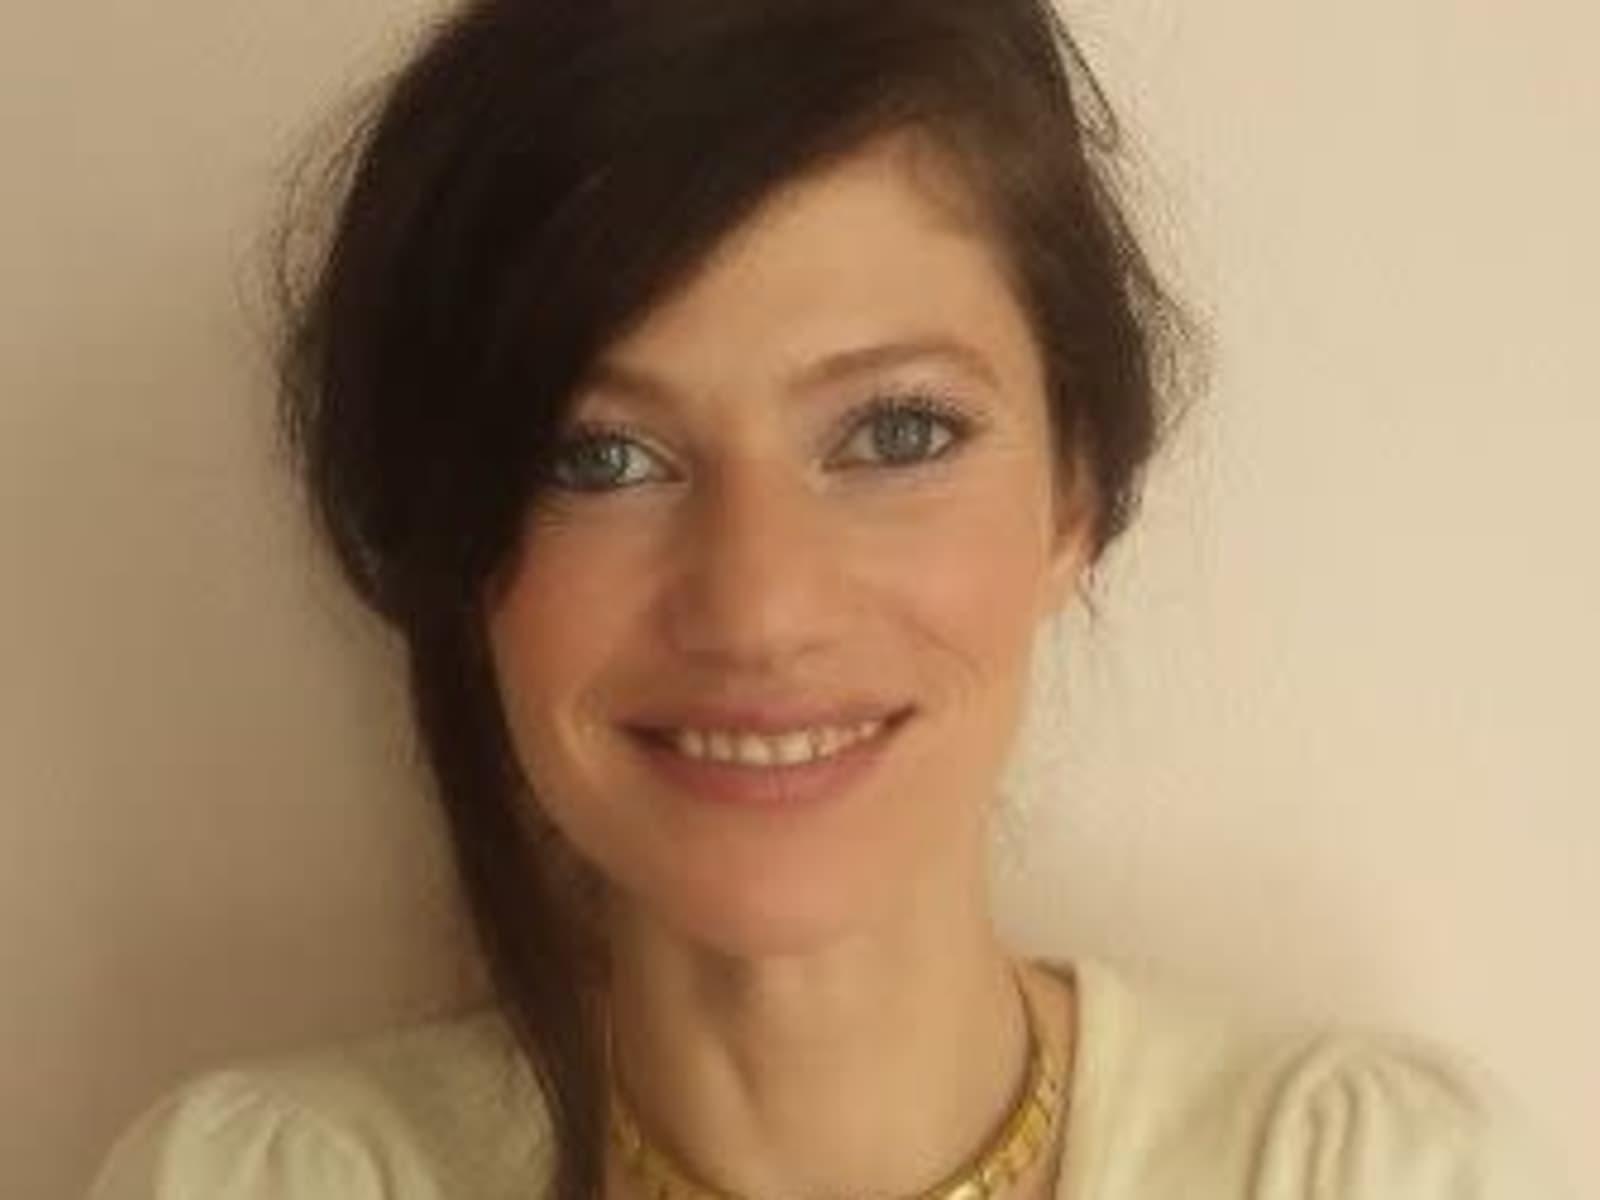 Isabel from London, United Kingdom